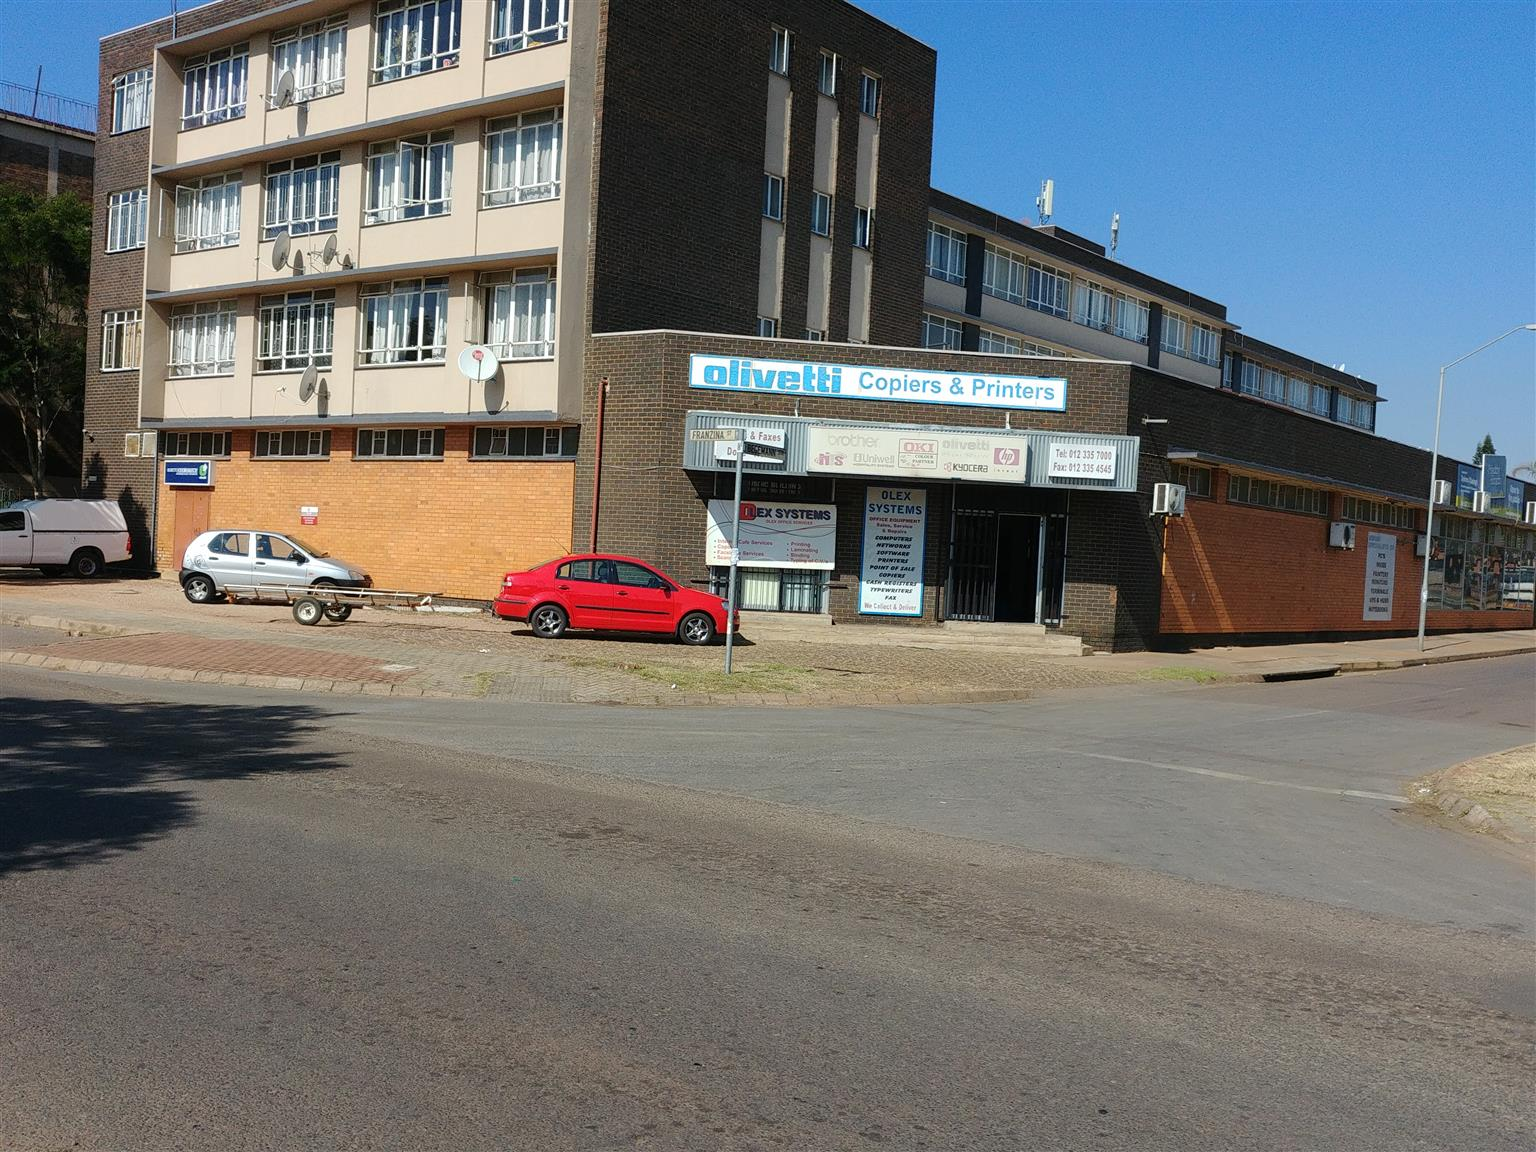 Shops/Offices/Distribution Depot/Light Manufacturing/Bulk Storage/Mini Retail-  to let, Capital Park/Eloffsdal, Pretoria